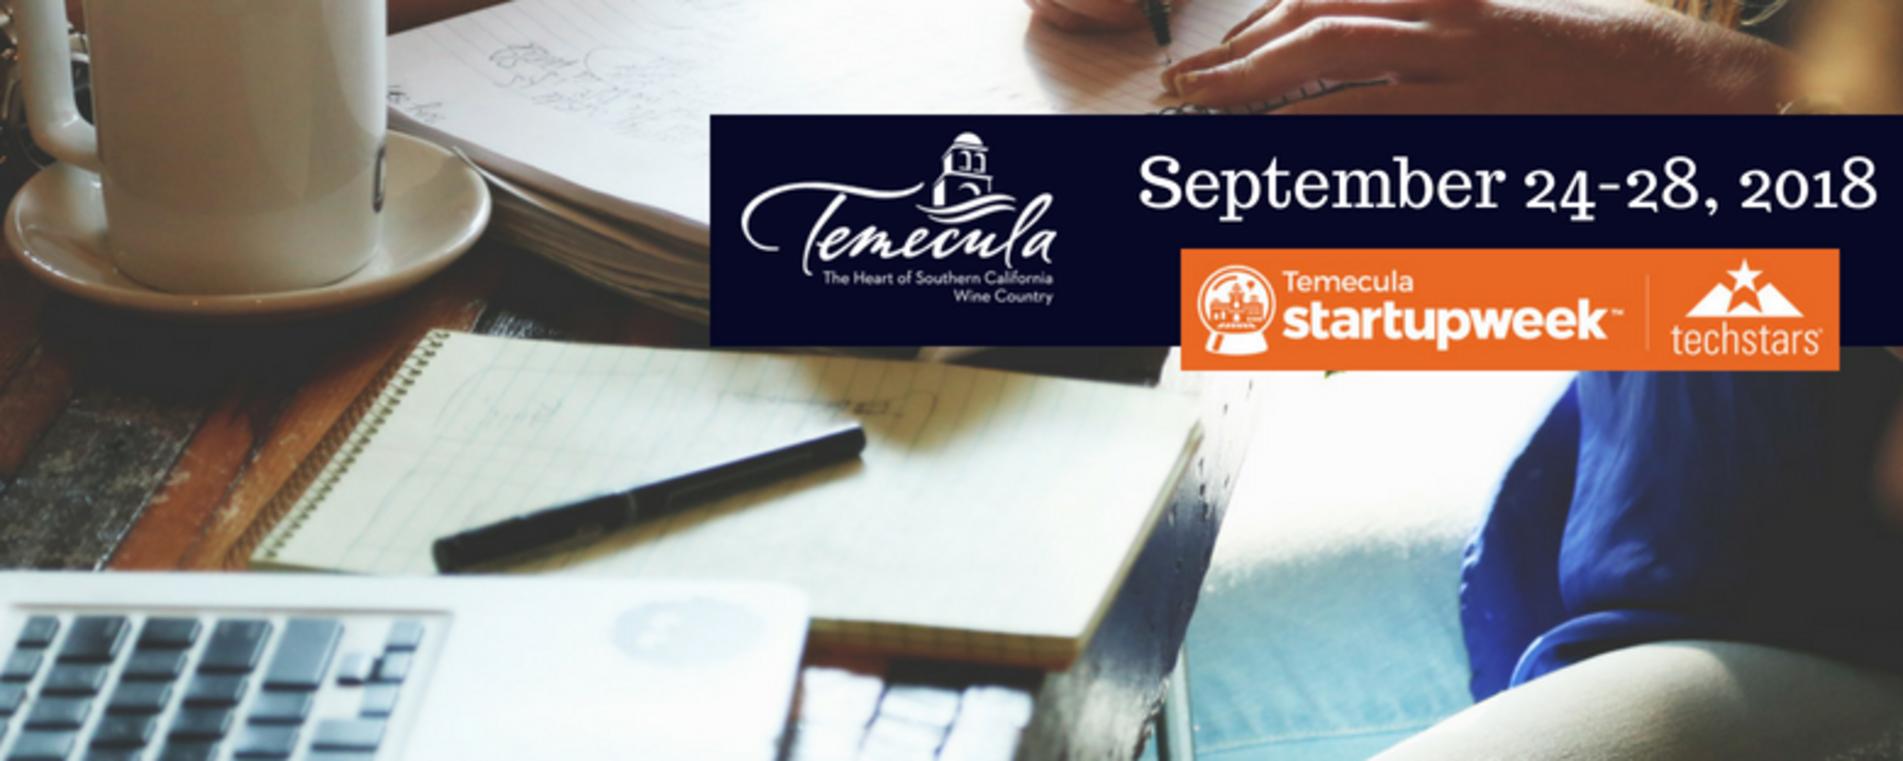 Techstars-Temecula-Startup.png